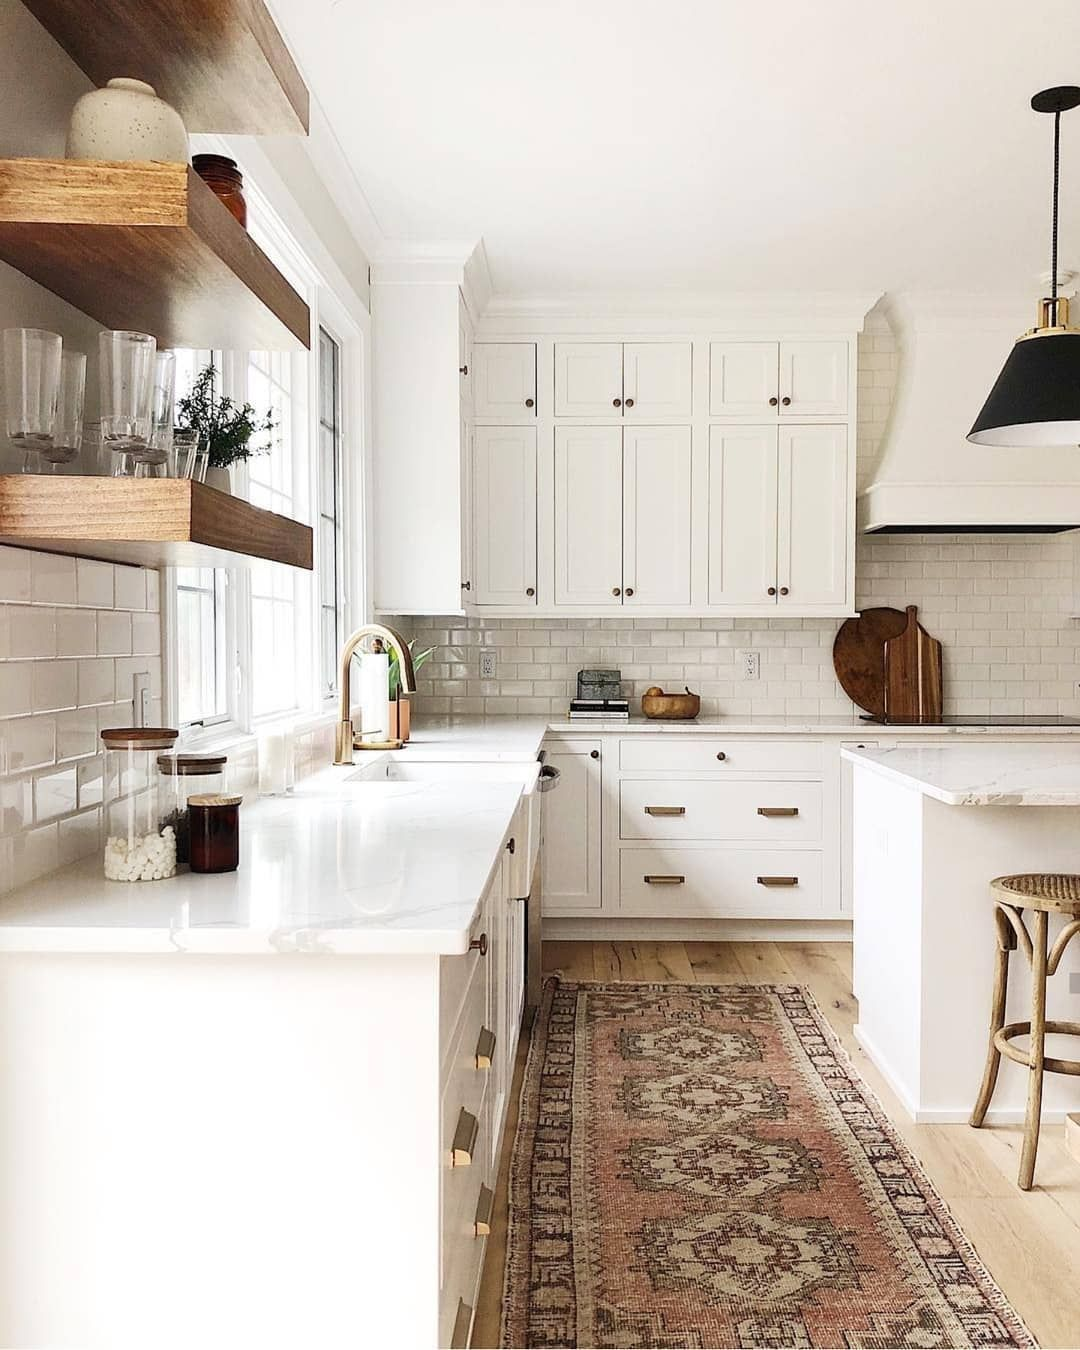 Erin Chelius On Instagram All Of This Design Housesevendesign Cheliushouseofdesign In 2020 Kitchen Inspiration Design Kitchen Inspirations Kitchen Remodel